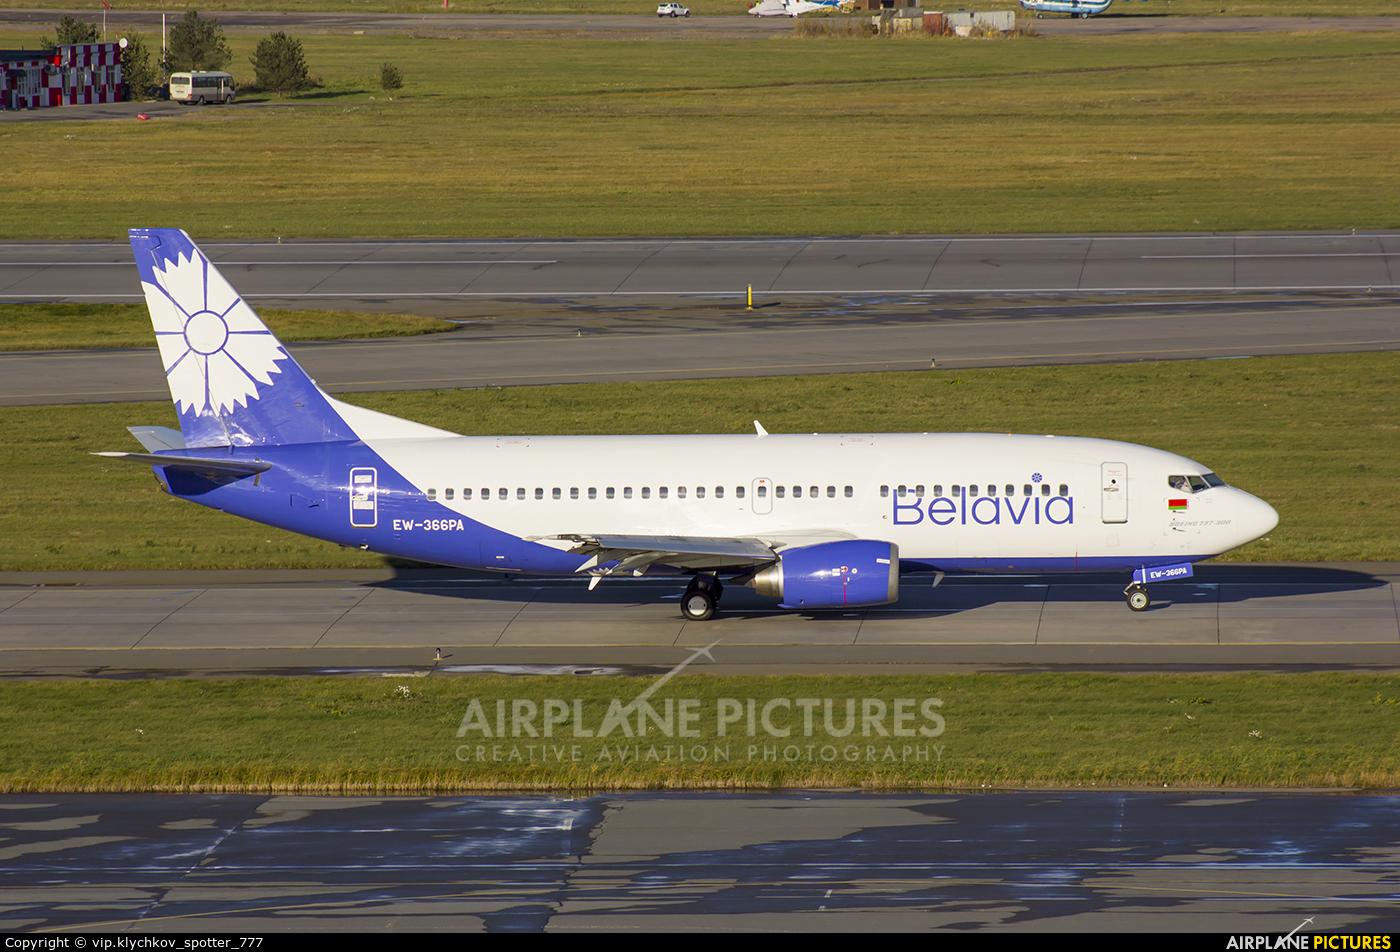 Belavia EW-366PA aircraft at St. Petersburg - Pulkovo